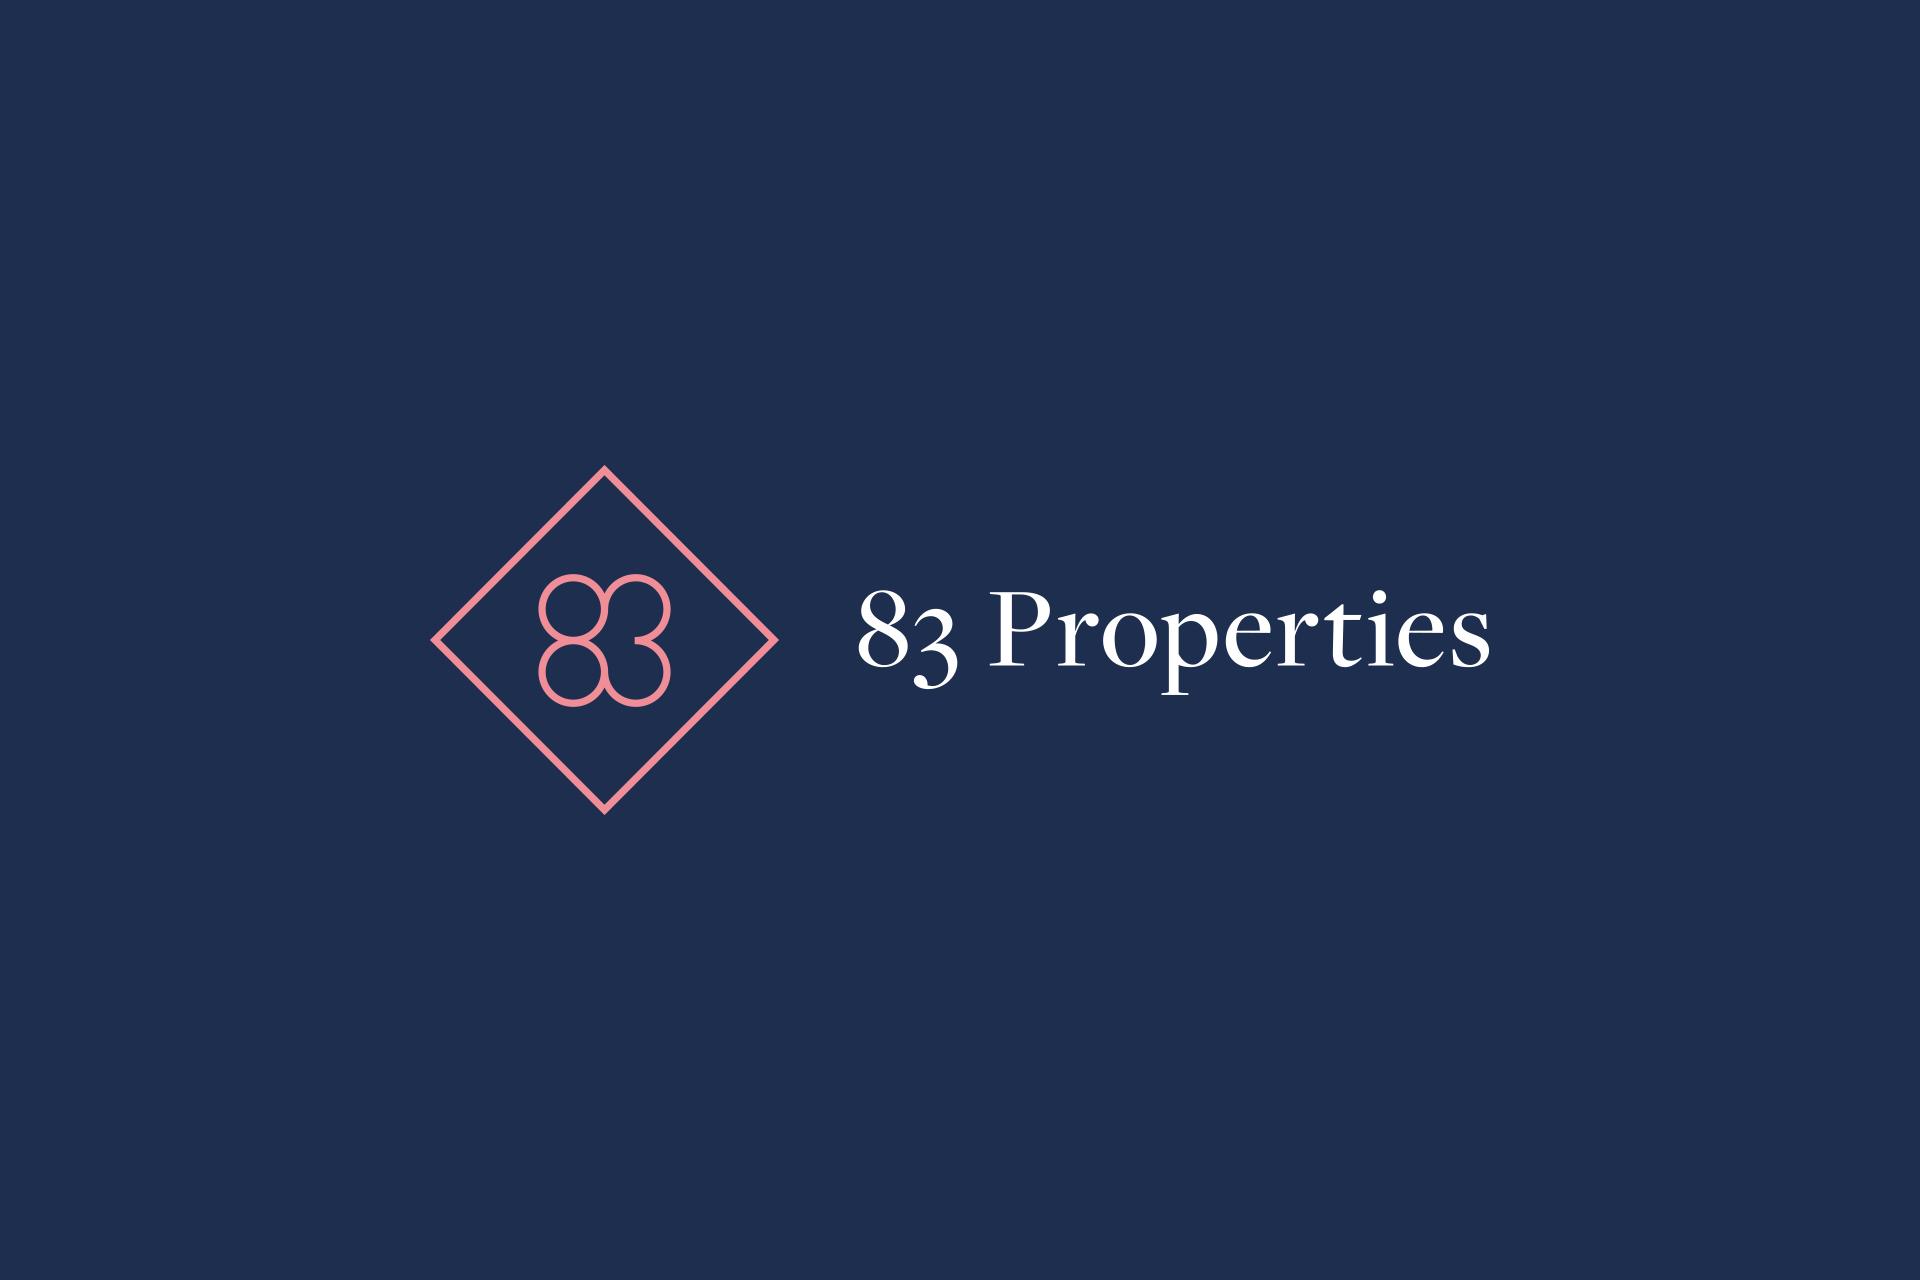 83 Properties Brand Identity